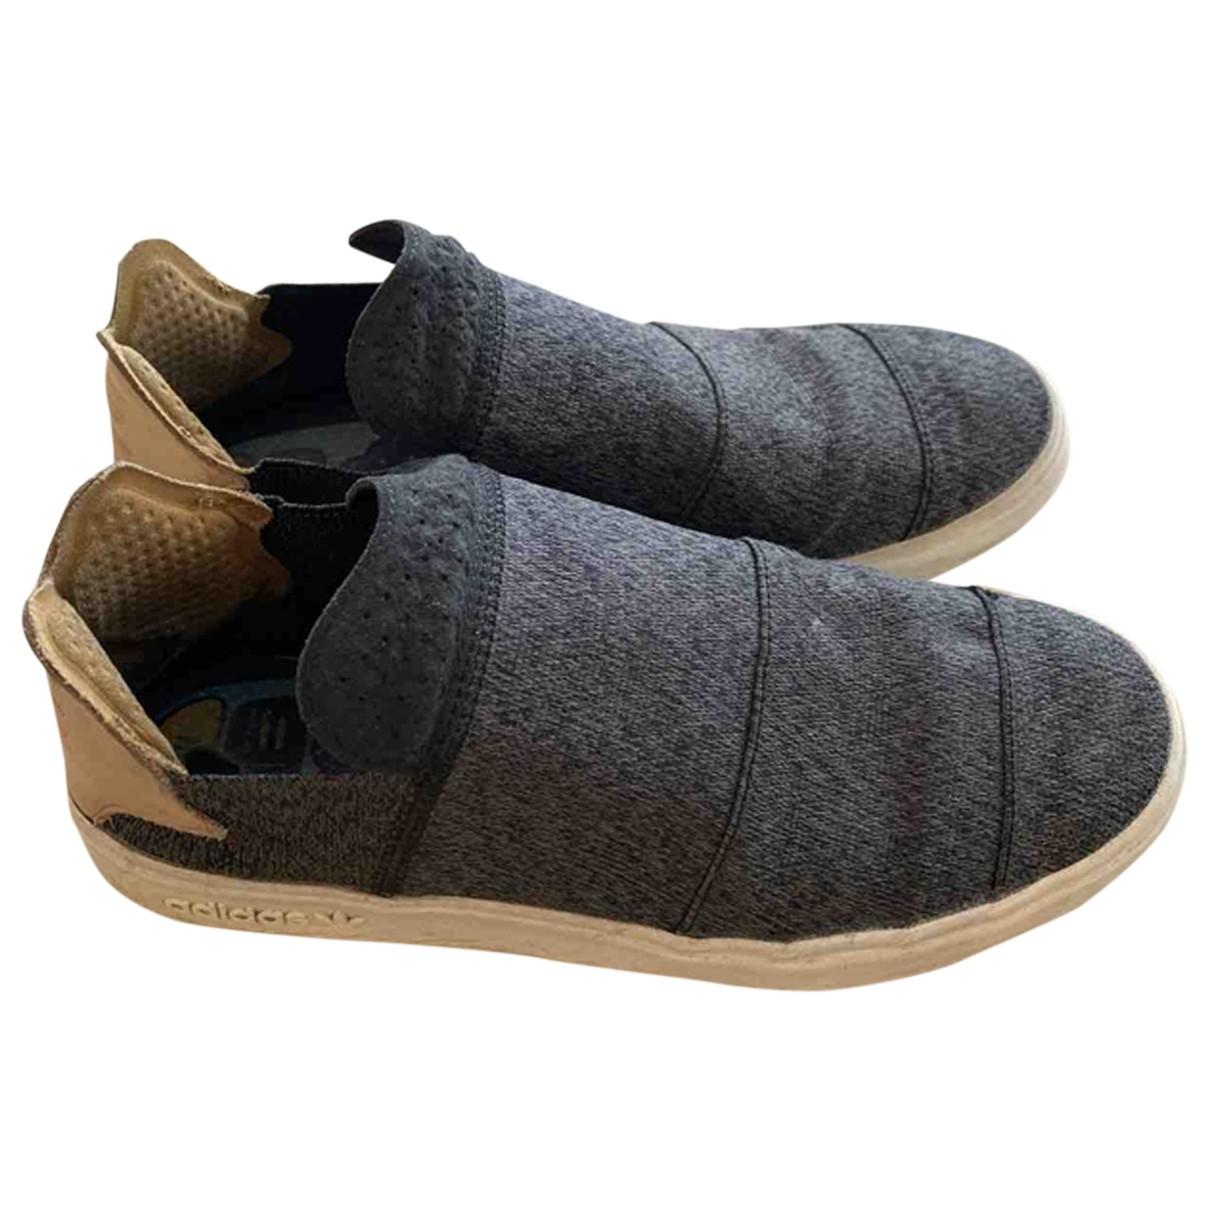 Adidas X Pharrell Williams \N Sneakers in  Anthrazit Leinen